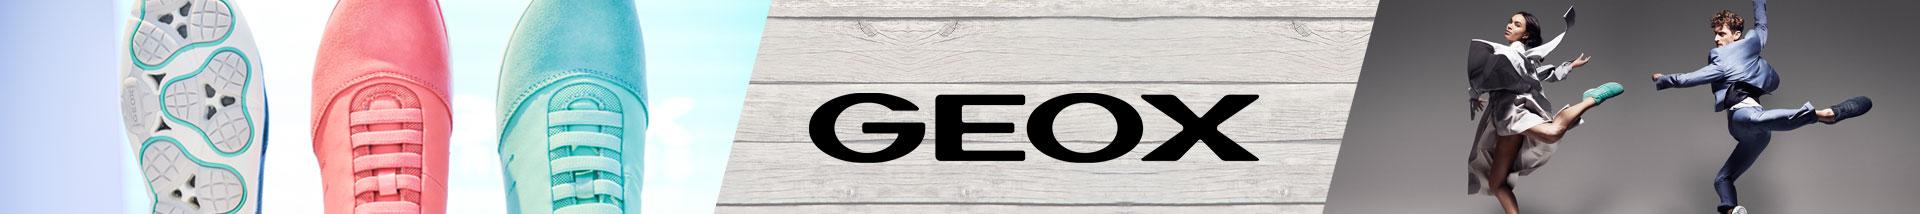 Geox Shoes \u0026 Footwear for Sale | Geox